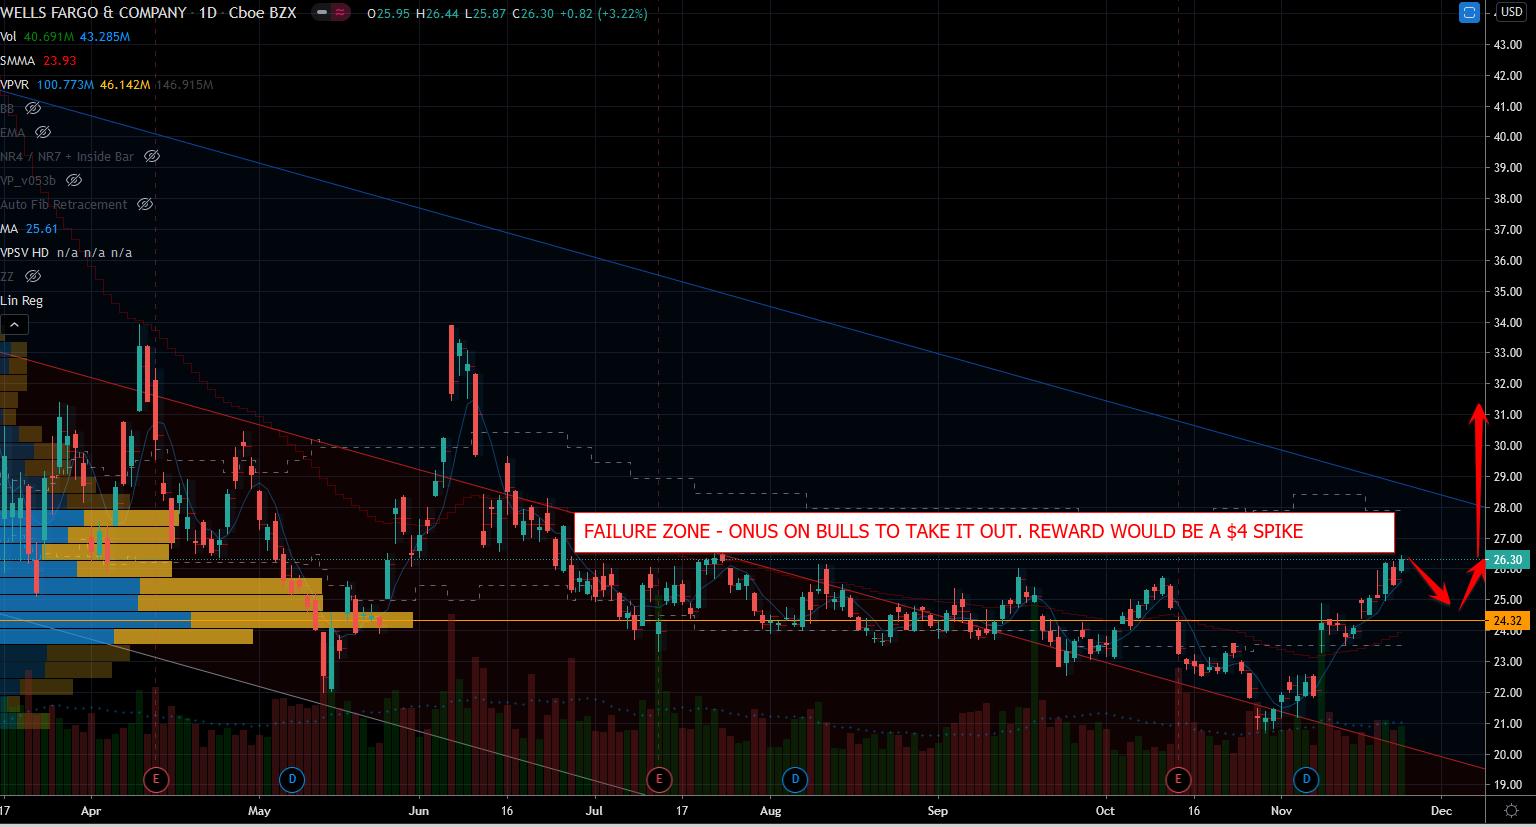 Wells Fargo (WFC) Stock Showing Failure Zone